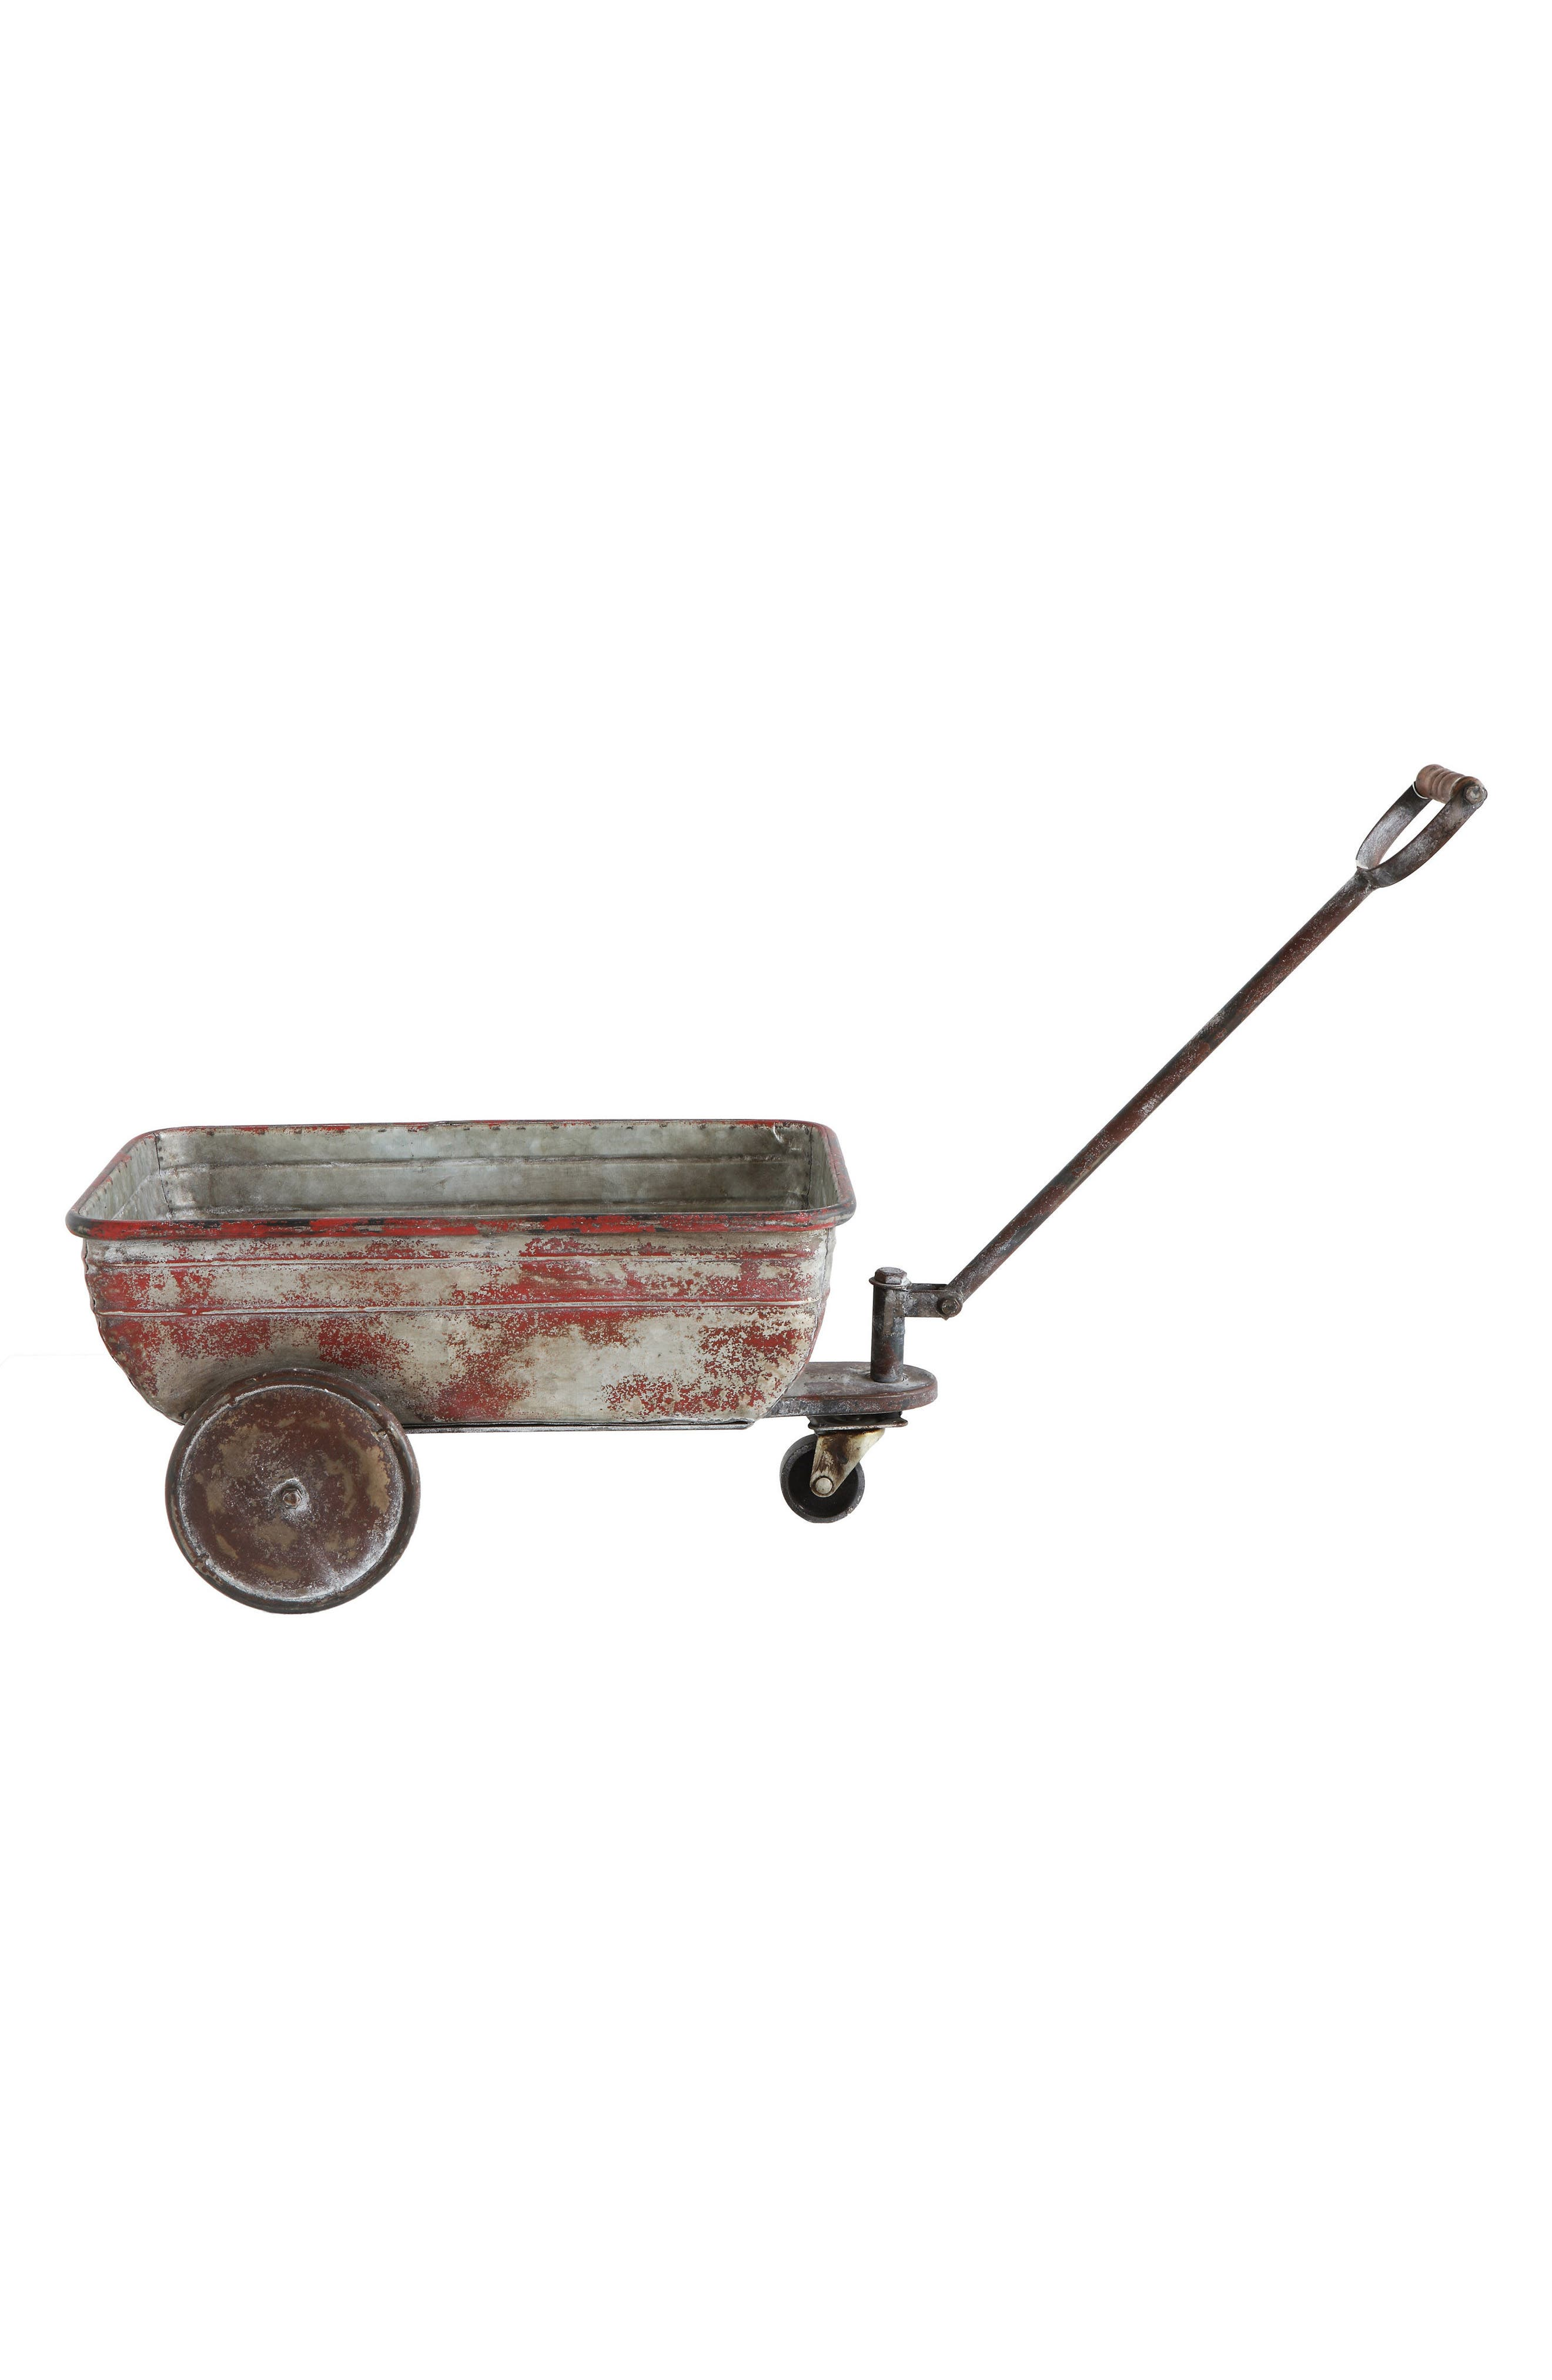 Main Image - Creative Co-Op Wagon Decoration